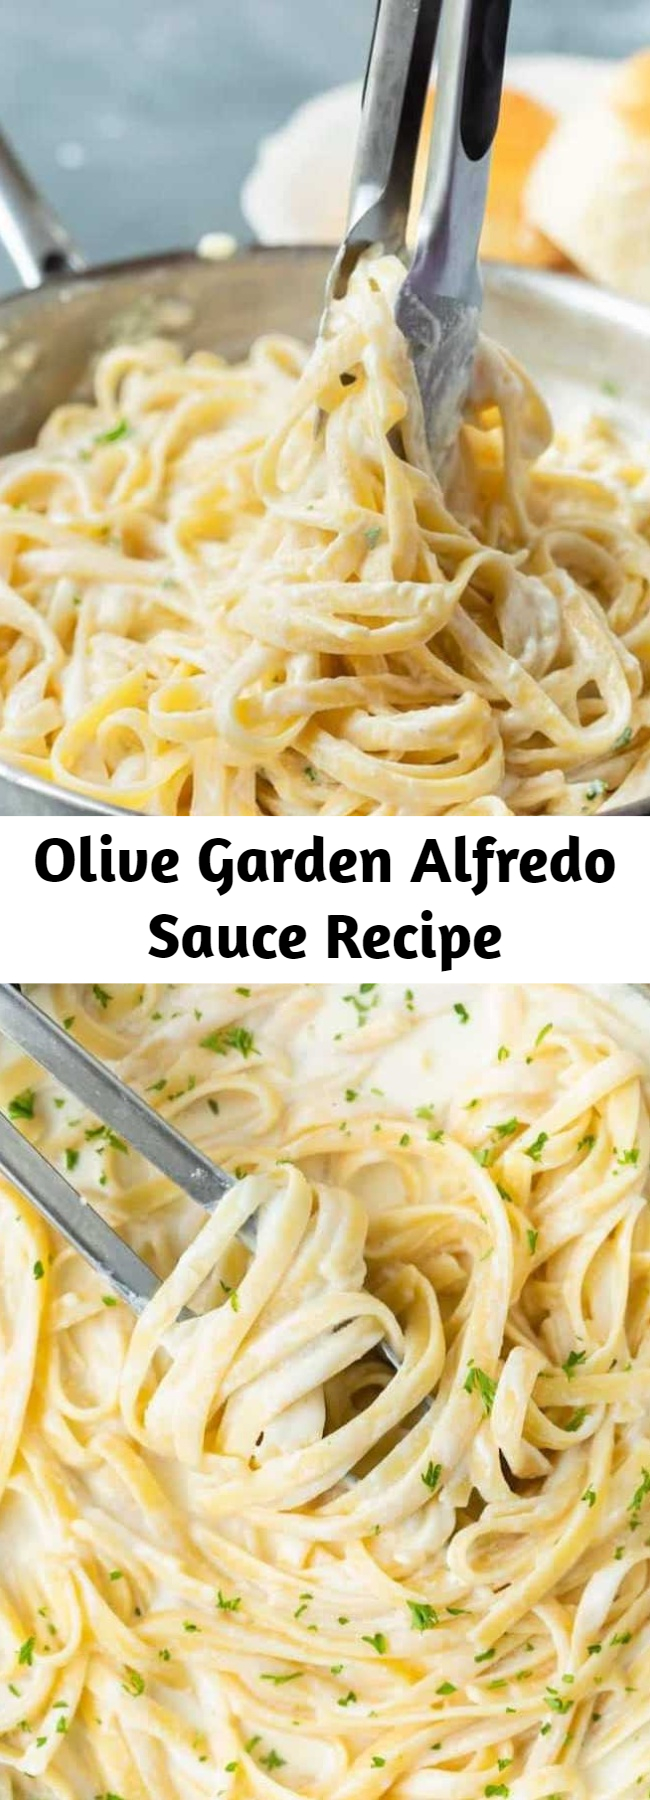 Olive Garden Alfredo Sauce Recipe - Make Olive Garden's Alfredo Sauce Recipe at home in just 20 minutes! Pair it with Fettuccine for an easy dinner idea the whole family will love! #alfredo #olivegarden #fettuccine #pasta #italian #dinner